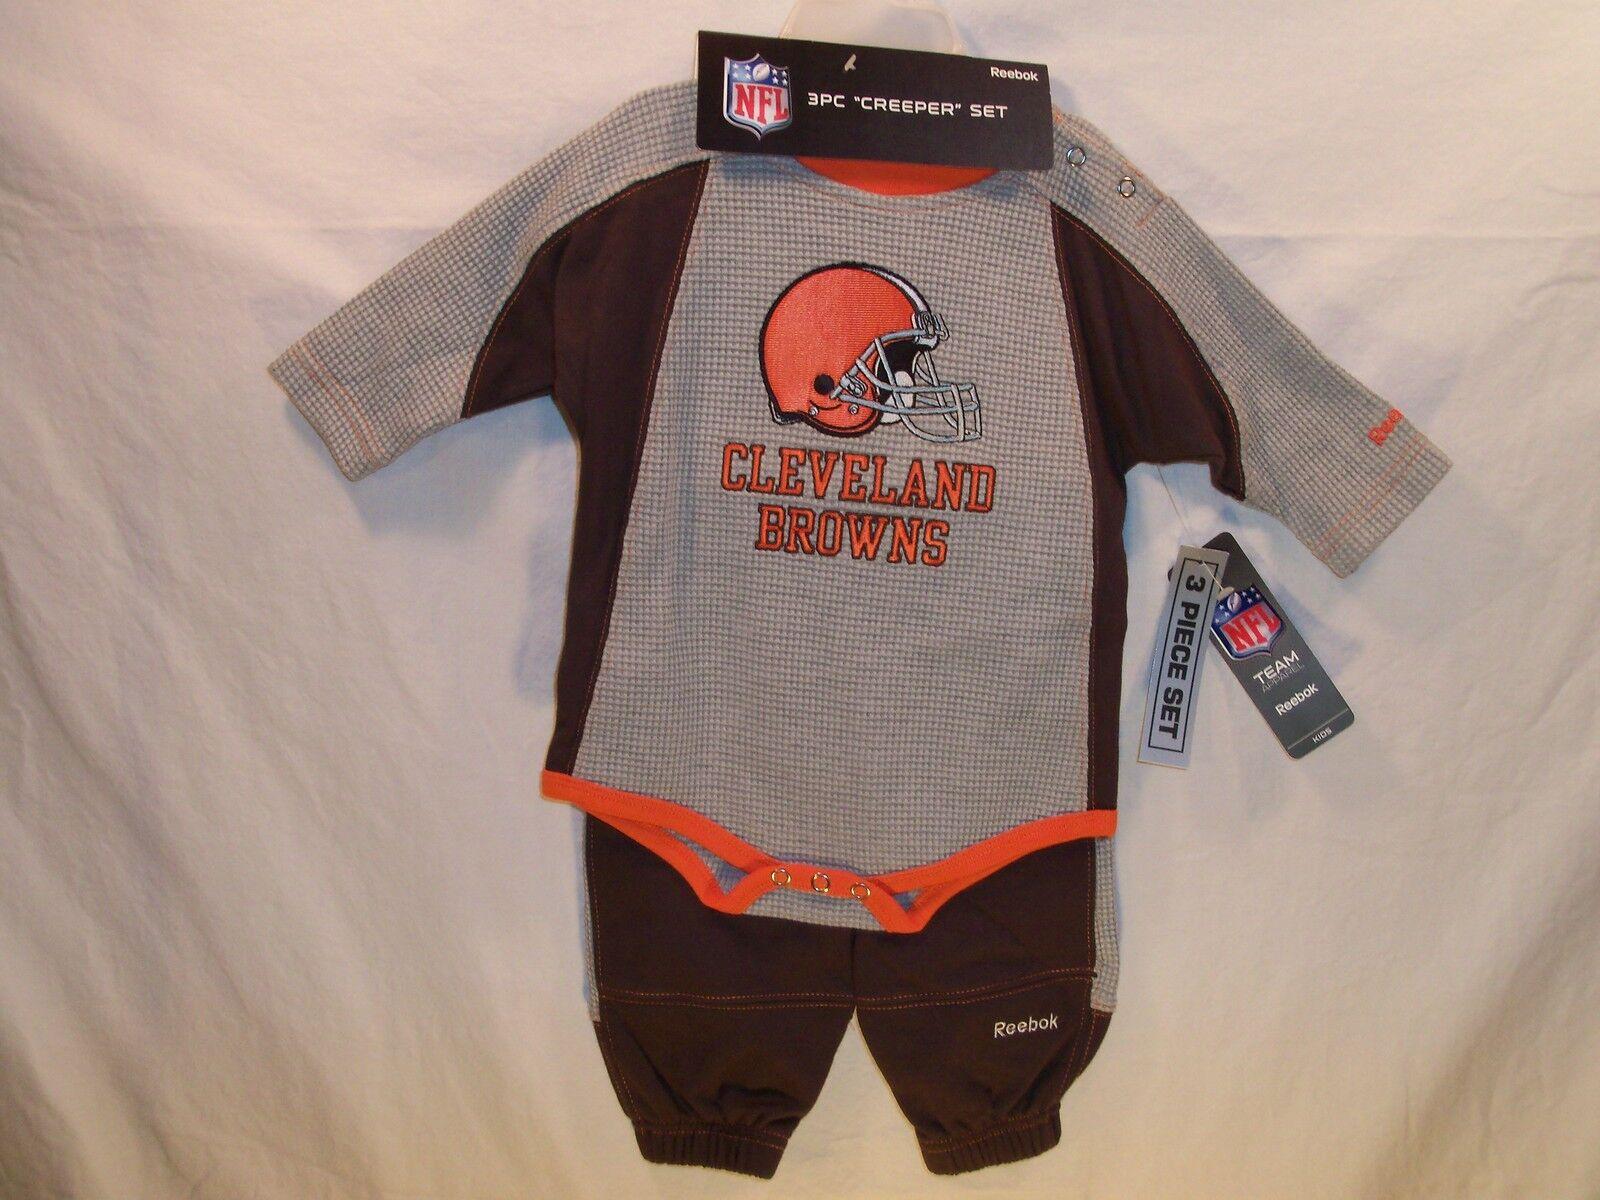 Cleveland Browns Nfl Bodysuit, Pants & Skull Cap Rbk 3/6 Months